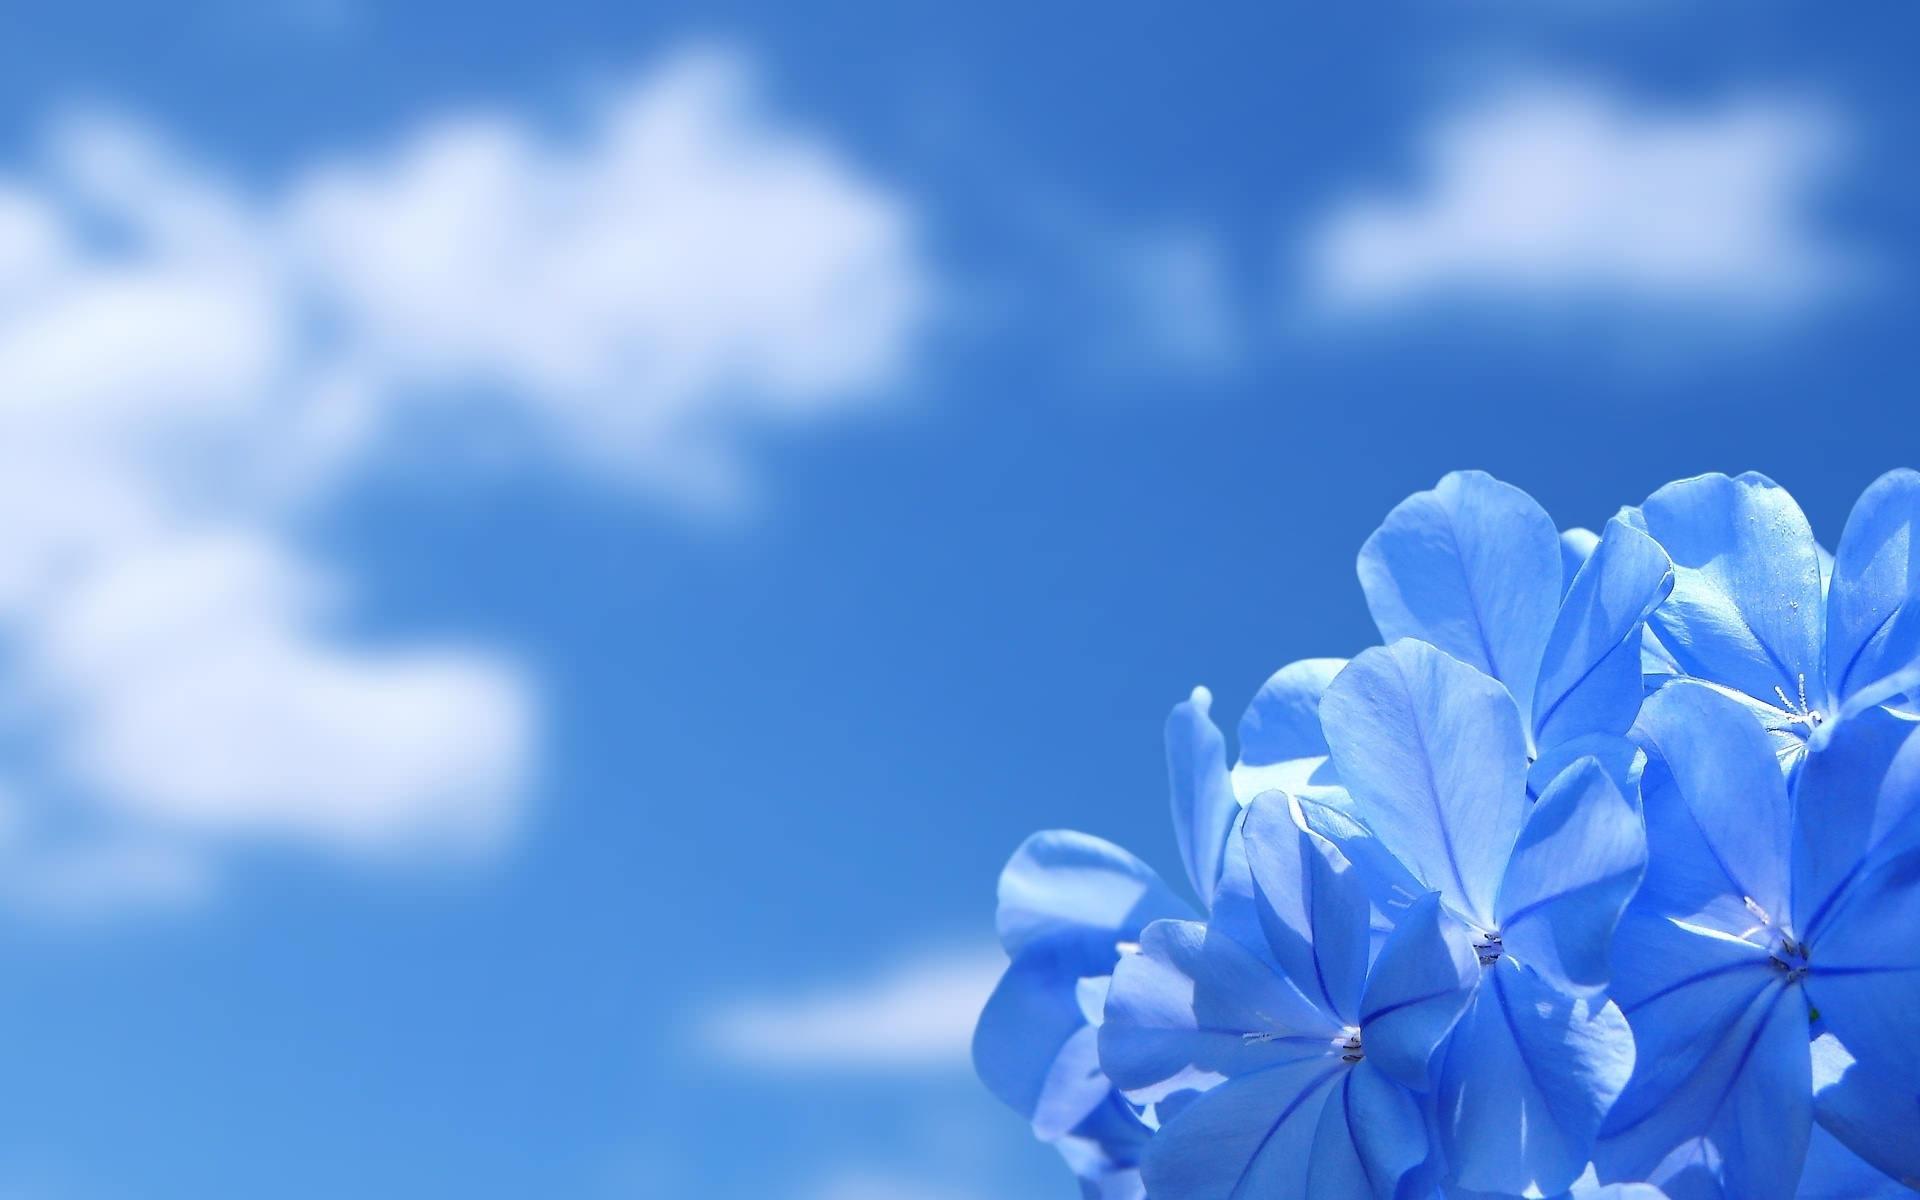 20 Blue Flower Backgrounds Wallpapers FreeCreatives 1920x1200